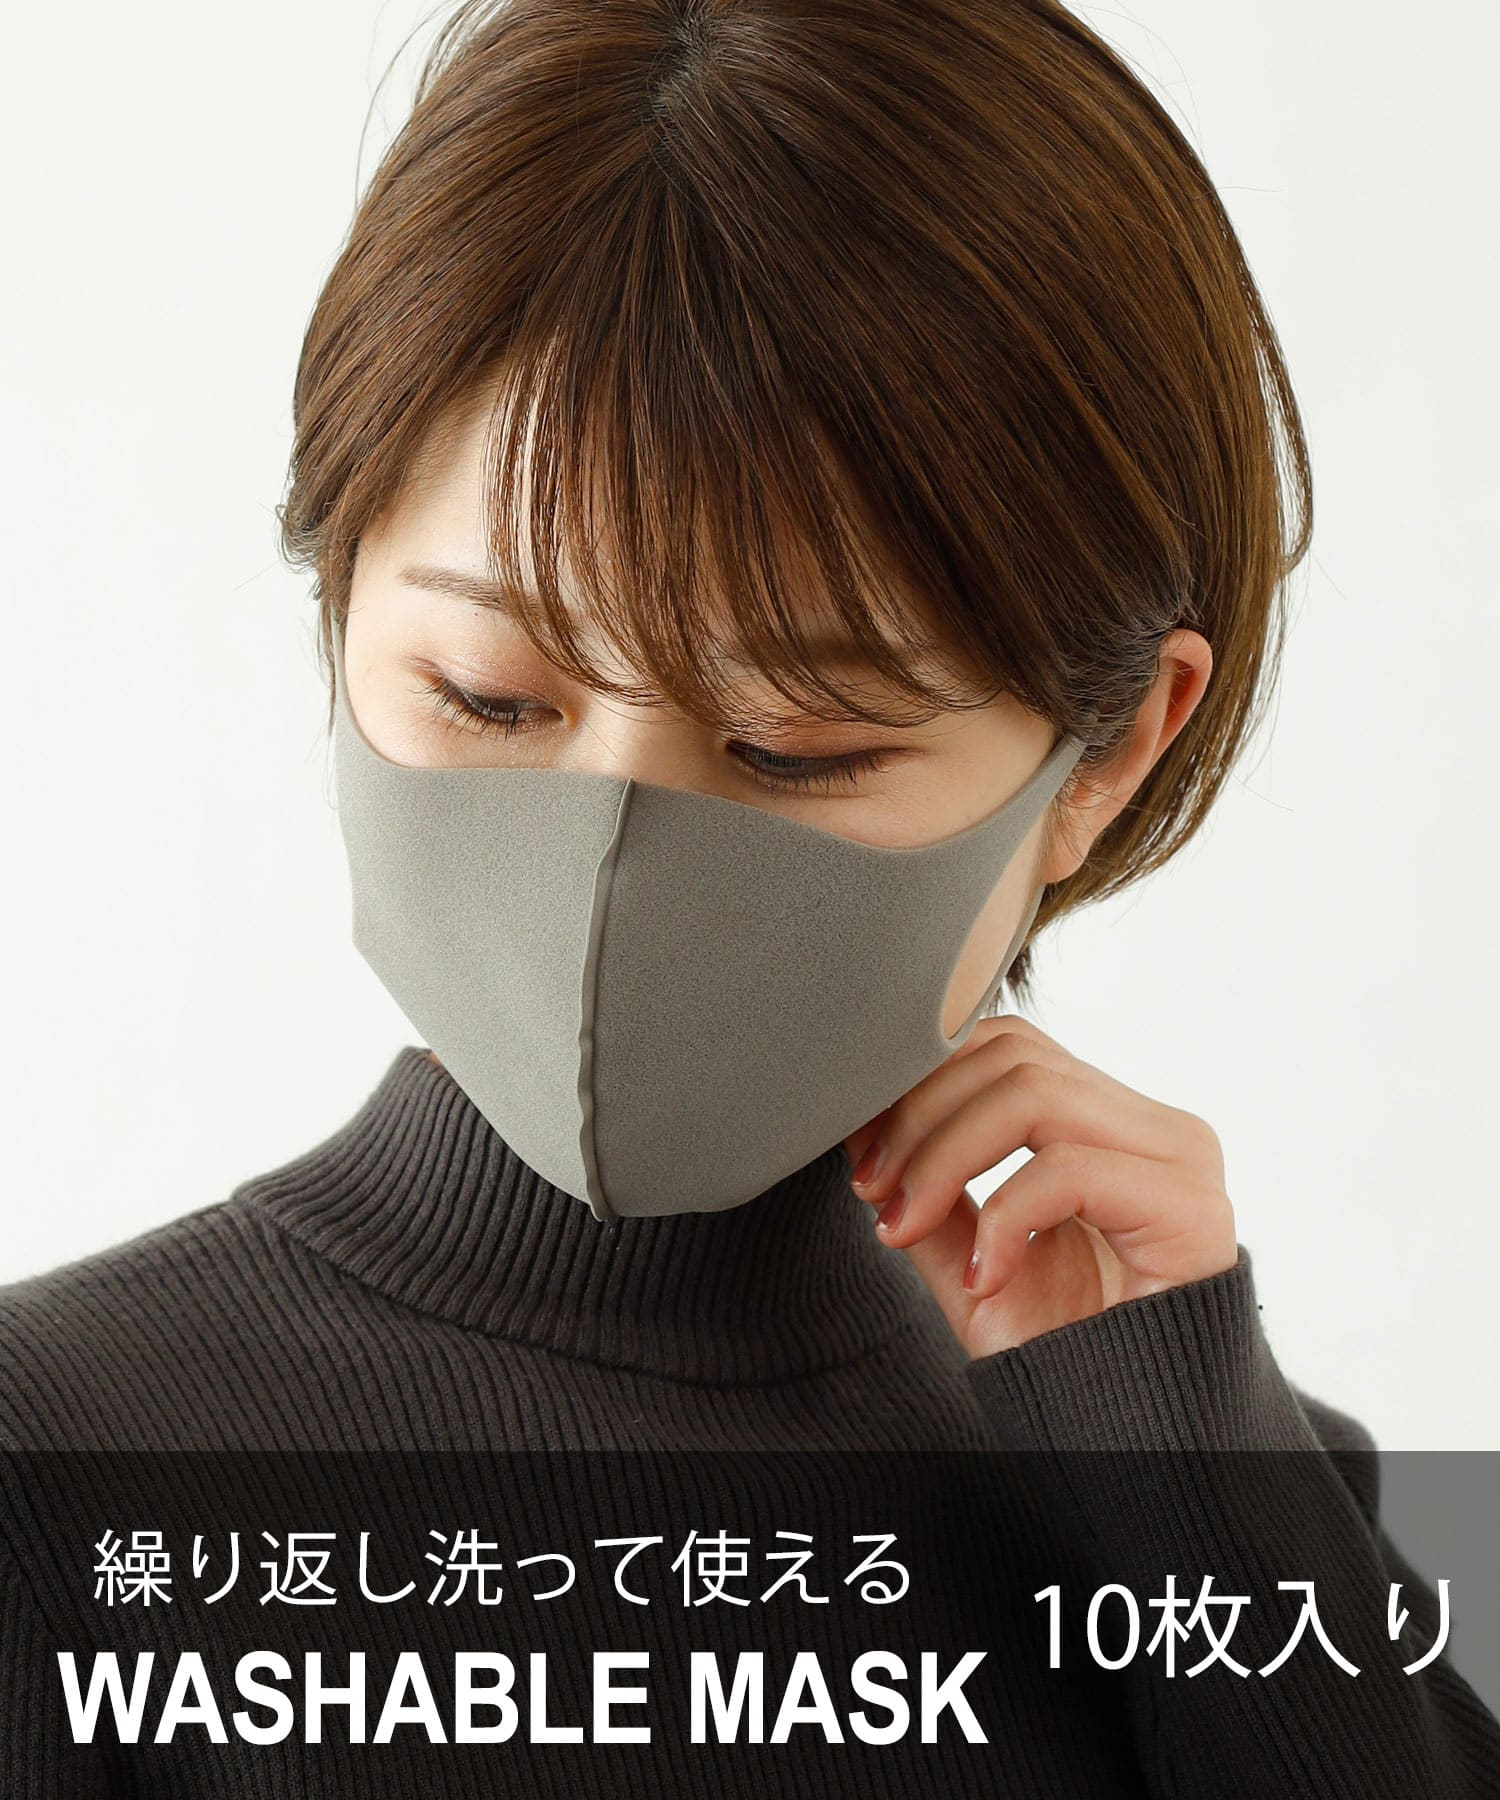 COLONY 2139(コロニー トゥーワンスリーナイン) ライフスタイル 【10枚セット】ウォッシャブルマスク/洗えるマスク グレー